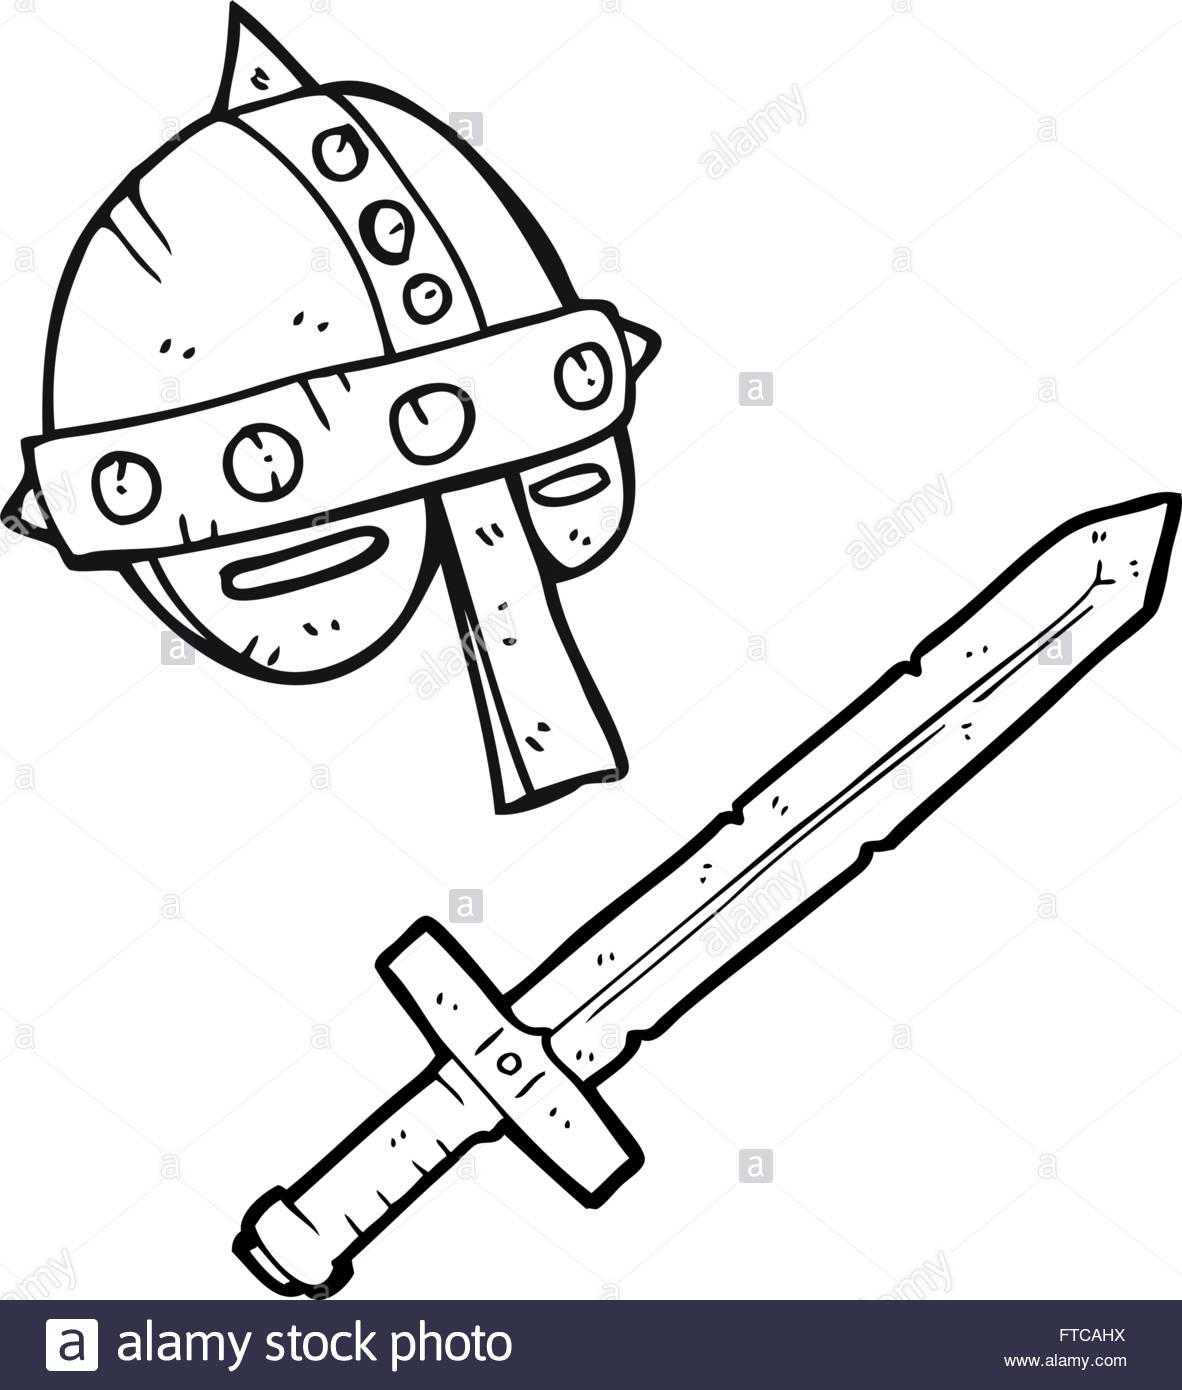 1182x1390 Freehand Drawn Black And White Cartoon Medieval Helmet Stock